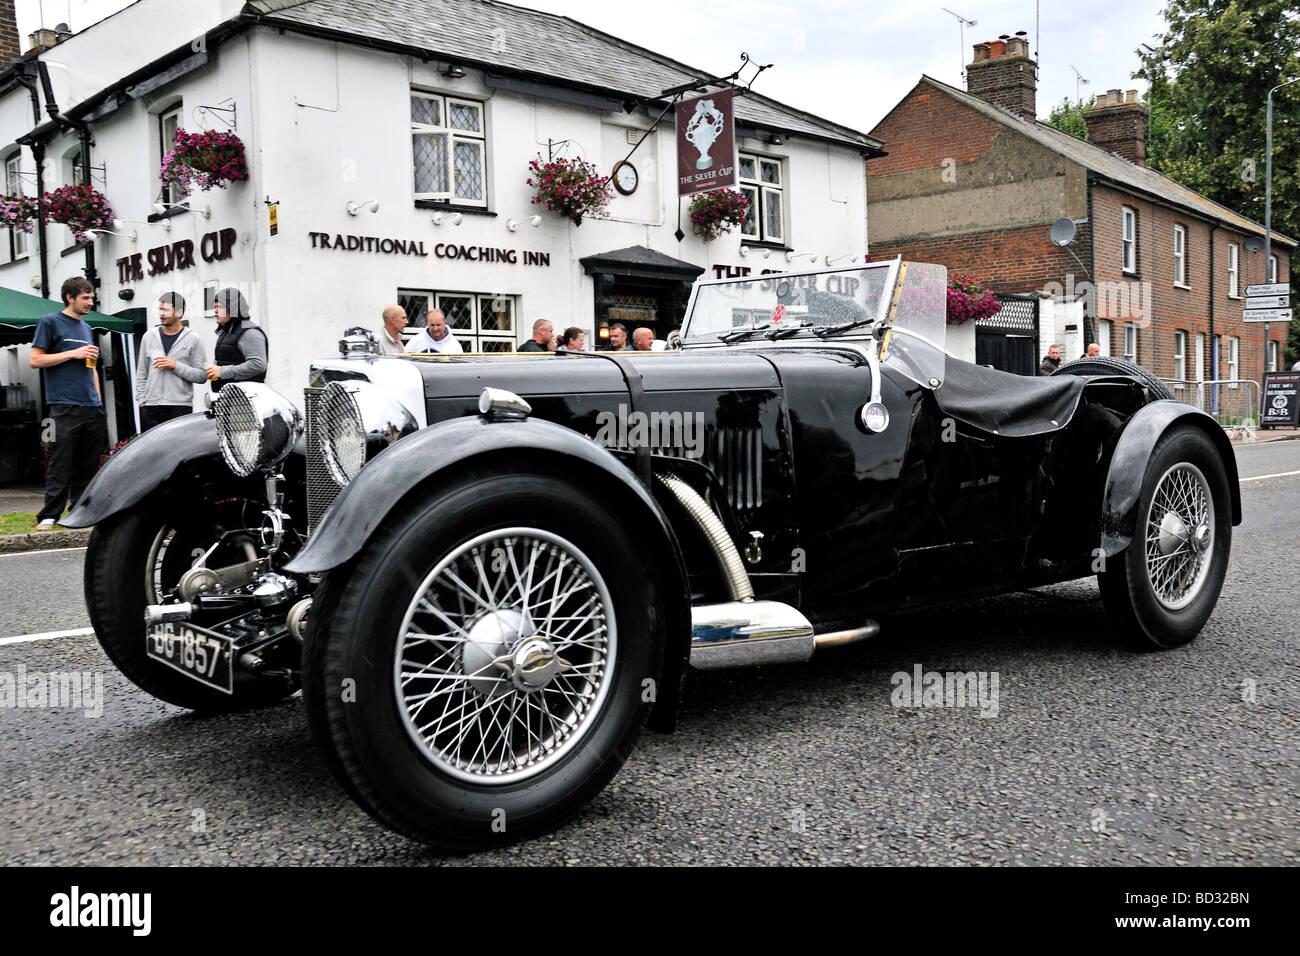 1933 aston martin le mans tourer stock photo royalty free image 25268649 alamy. Black Bedroom Furniture Sets. Home Design Ideas